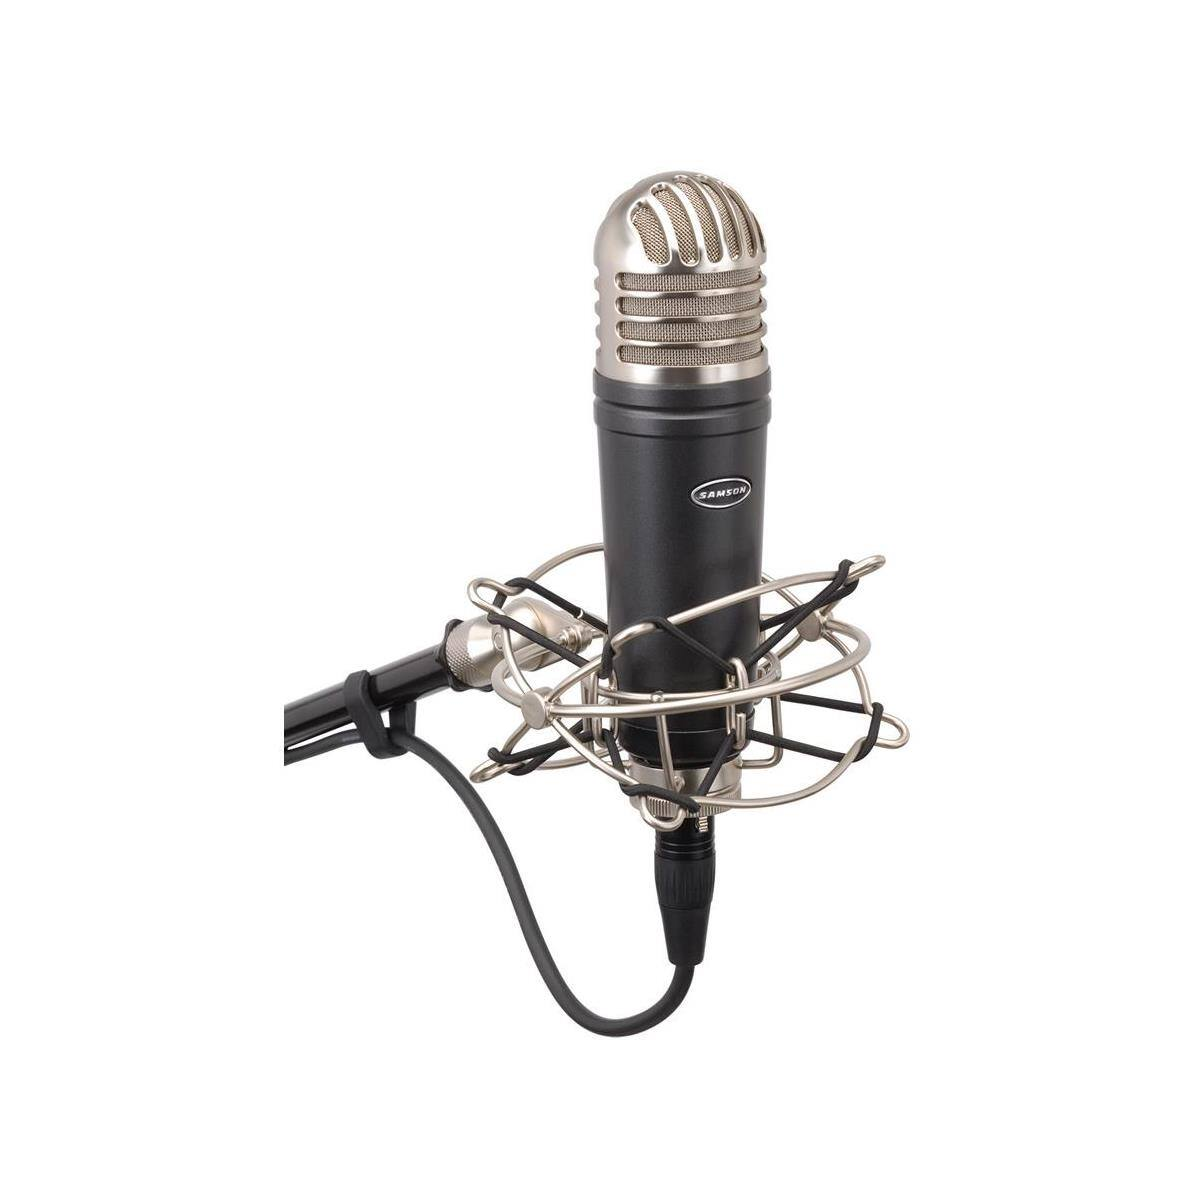 Samson MTR101A Diaphragm Studio Condenser Microphone w/ Shockmount & Pop Filter $50 + Free Shipping